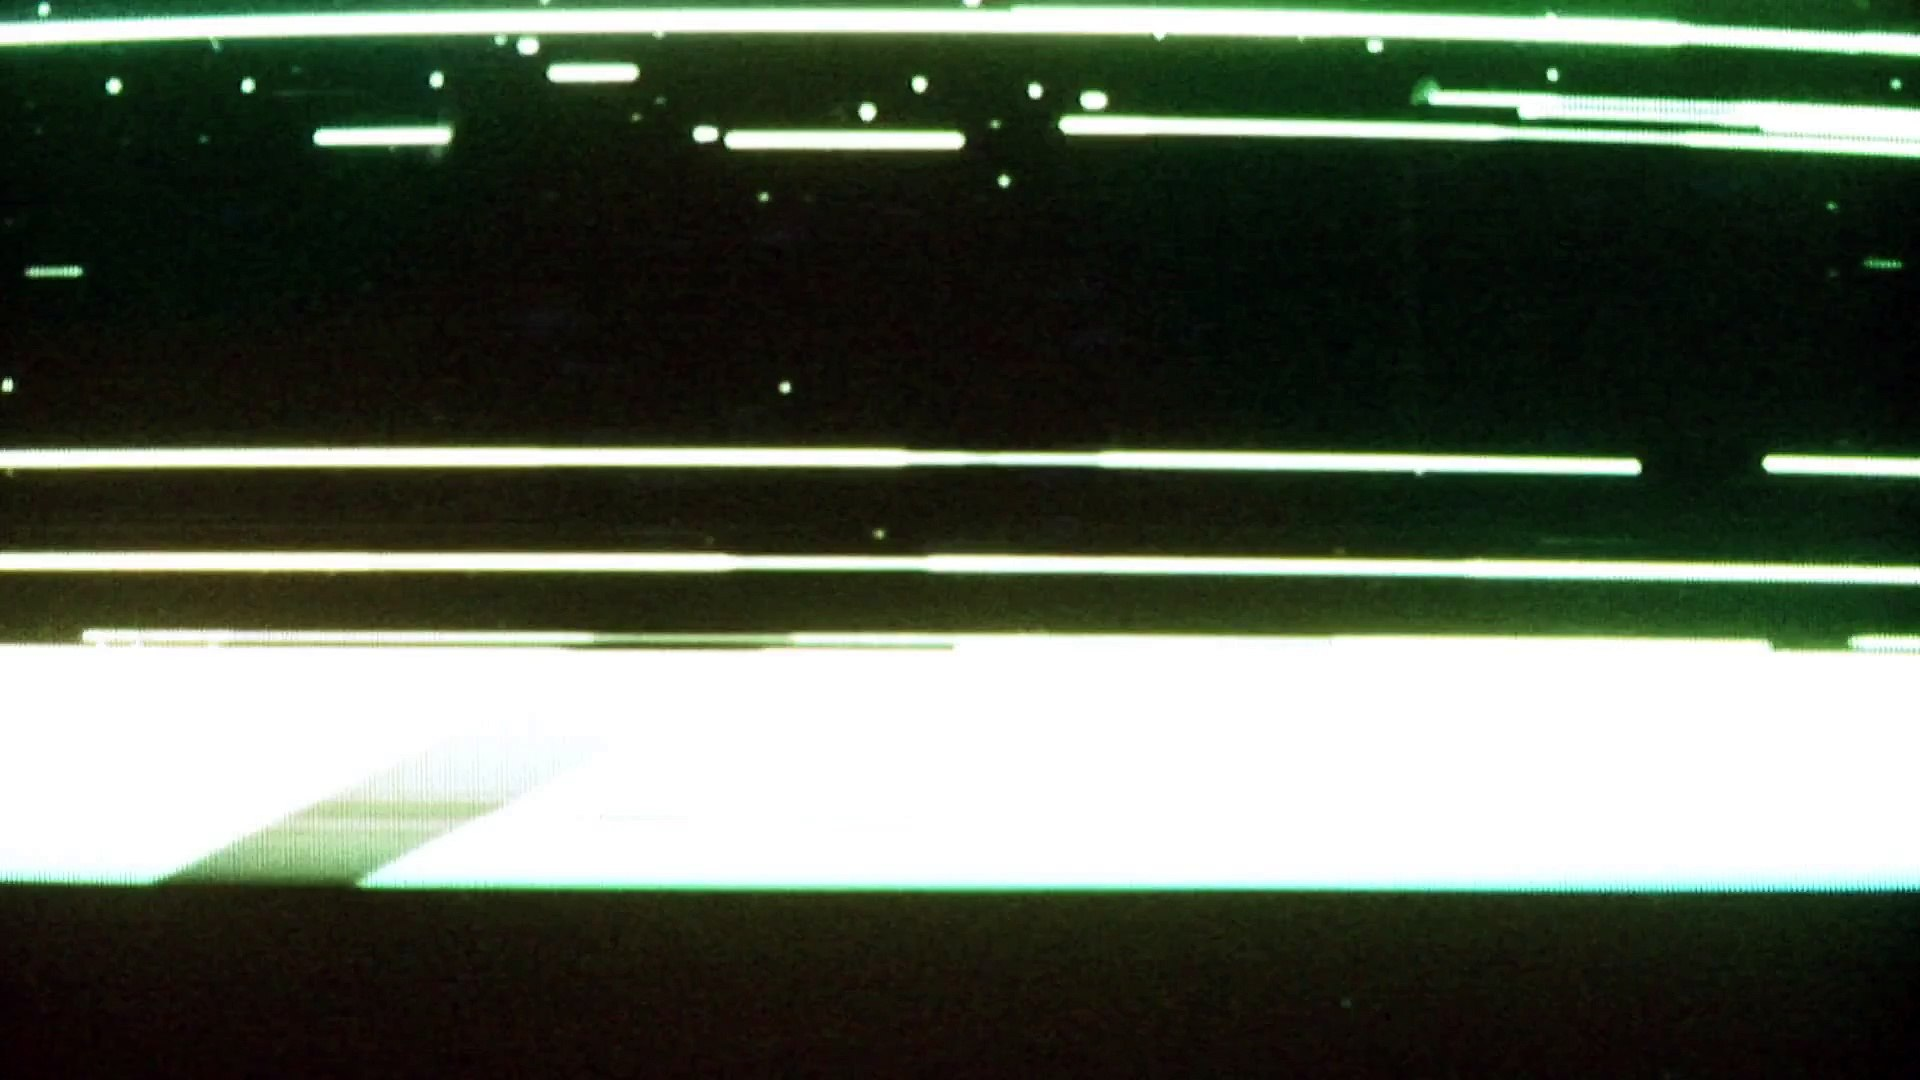 Extrait / Gameplay - Alien: Isolation (Gameplay Fuite dans un Conduit)